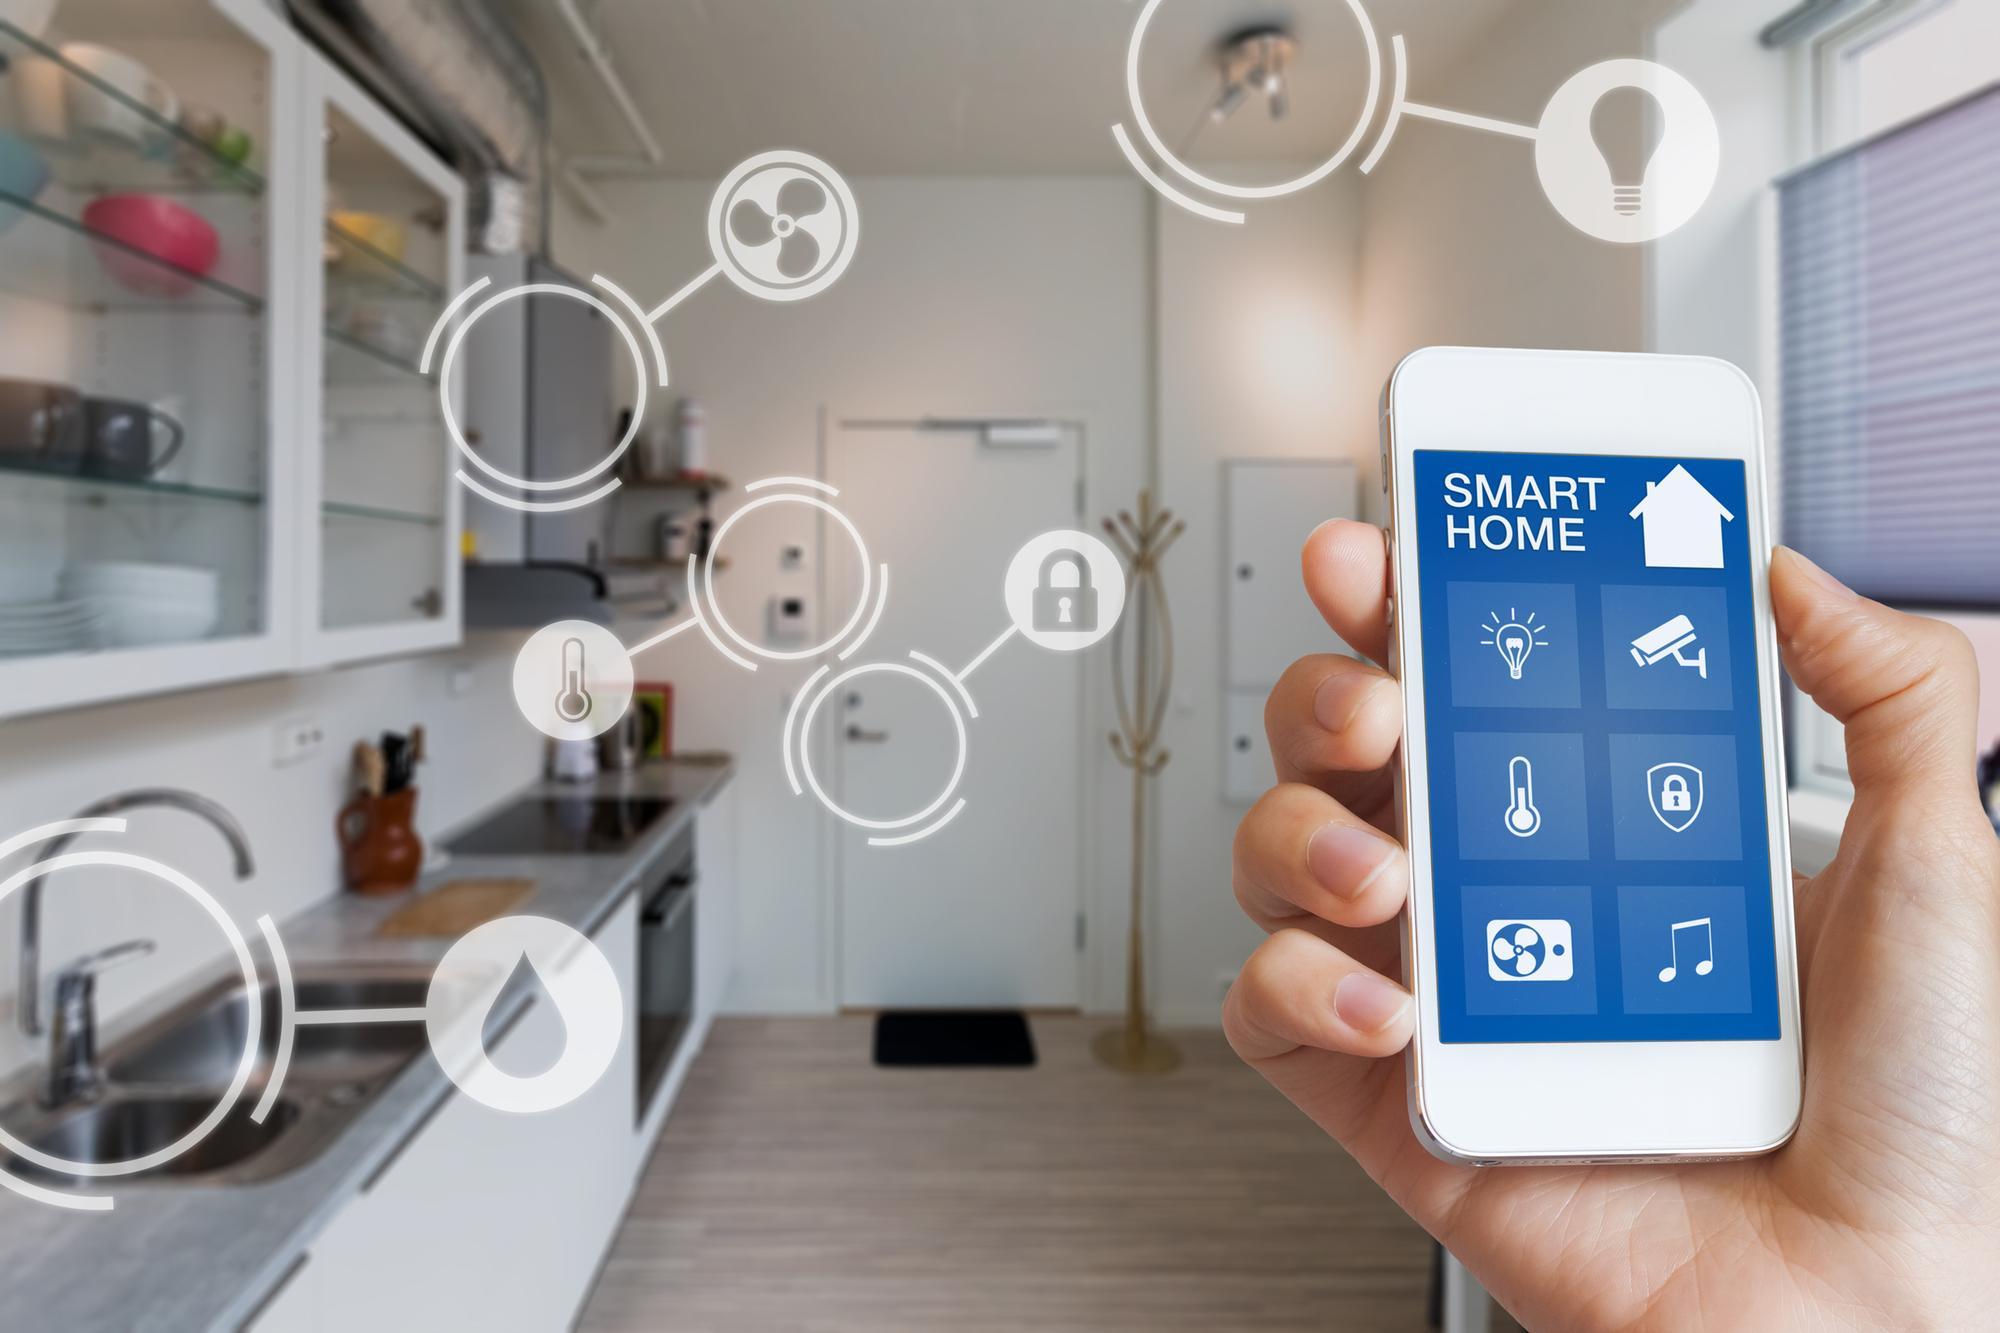 Five emerging tech trends that will shape the future of fintech